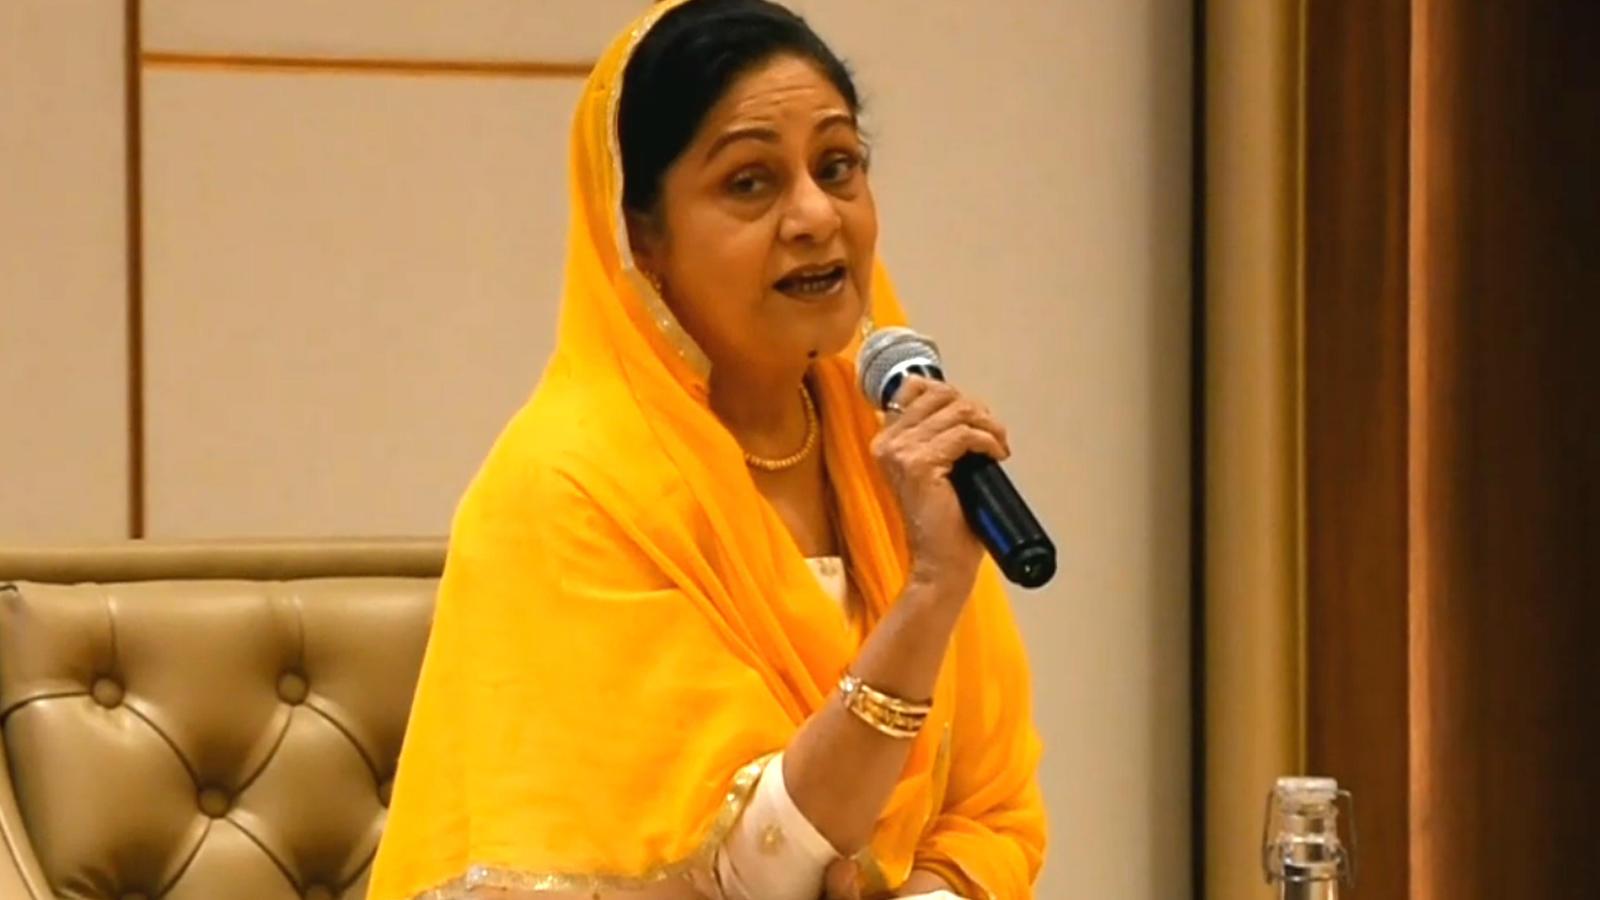 'Agar sab kuchh consent se hai toh #metoo ka jhagda hi nahi hai!': Aruna Irani in Lucknow